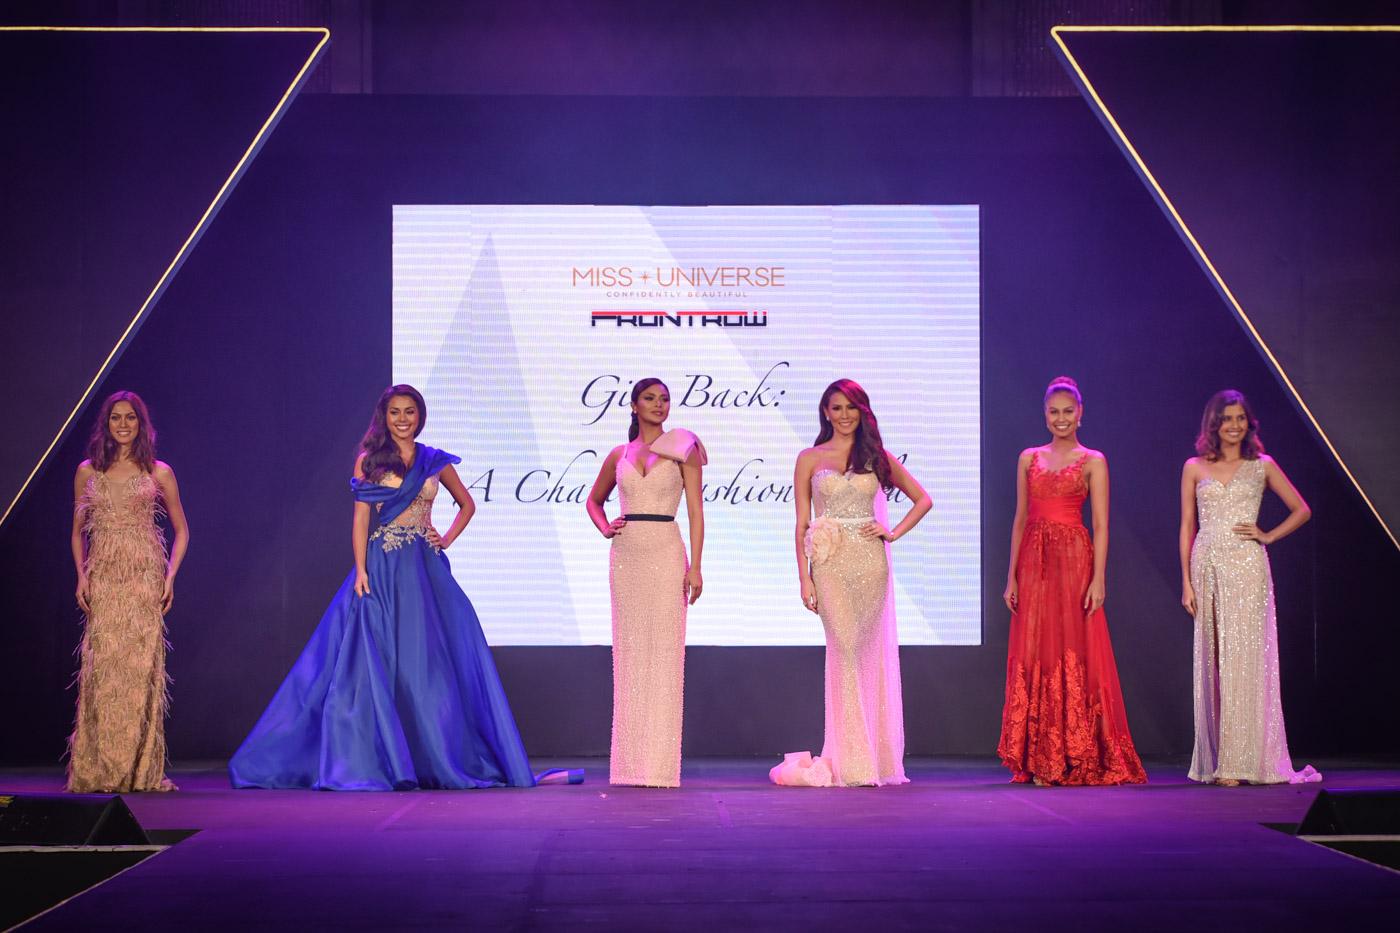 The 6 former Miss Universe Philippines title holders (L-R) Ariella Arida, MJ Lastimosa, Maxine Medina, Bianca Manalo, Venus Raj, and Shamcey Supsup